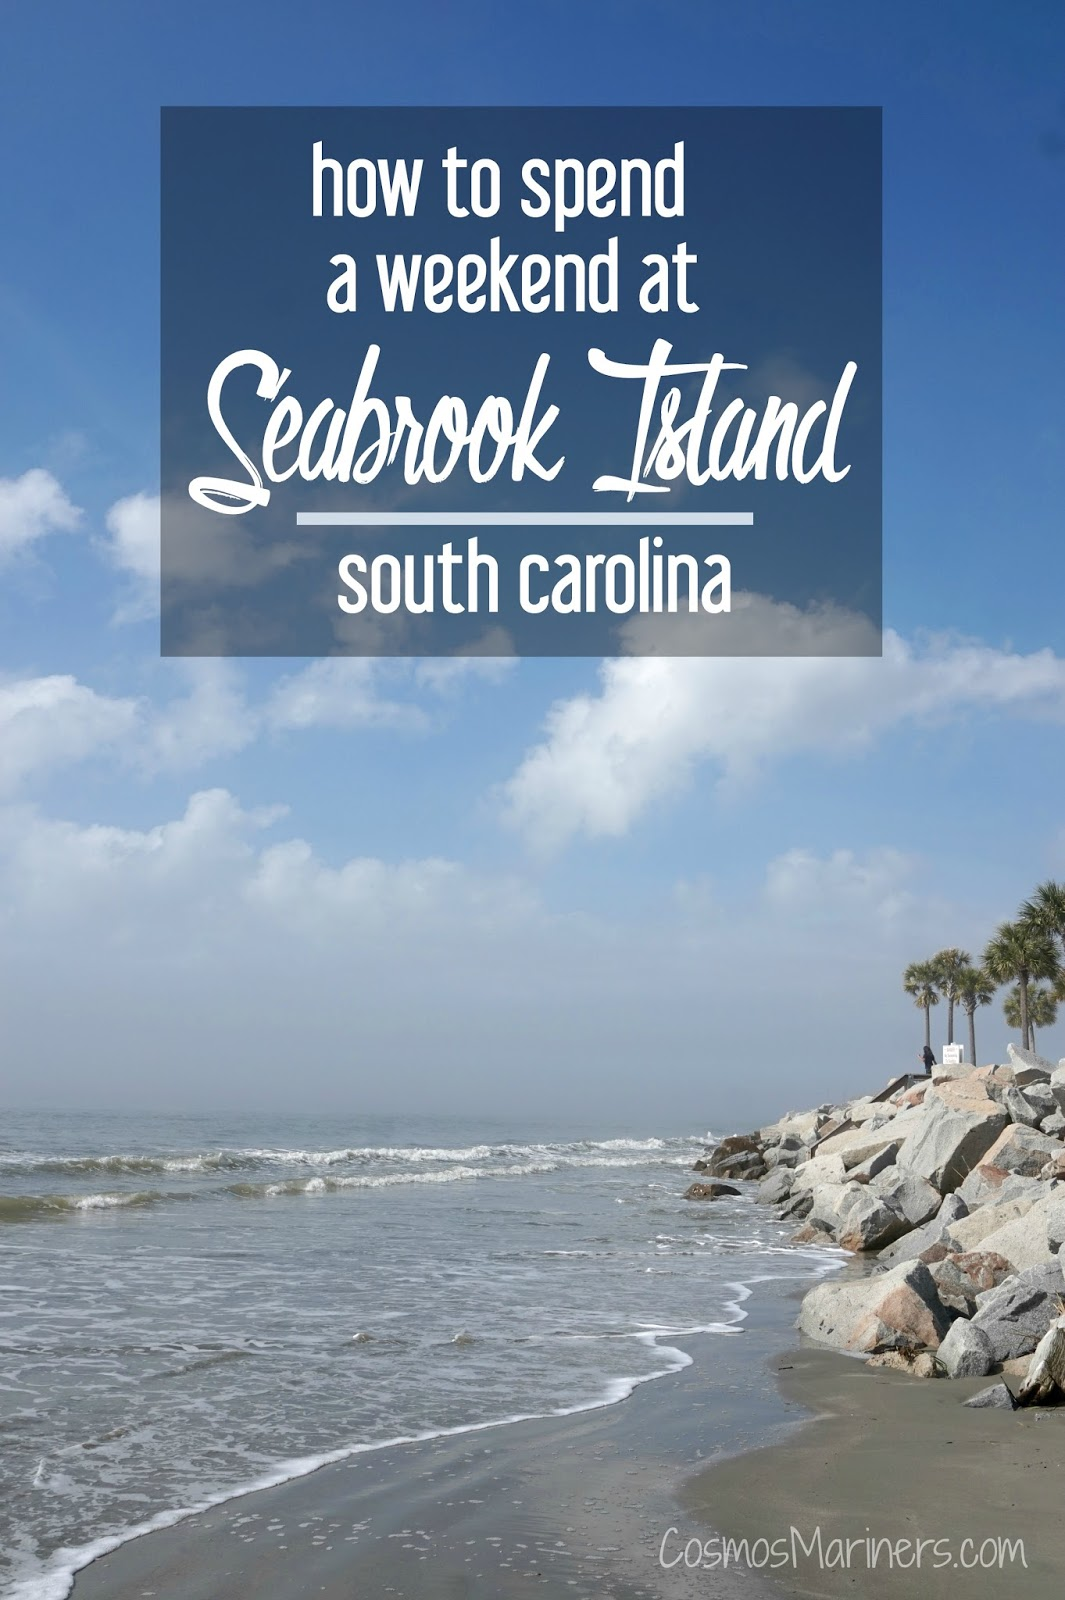 How To Spend A Weekend On Seabrook Island South Carolina Cosmosmariners